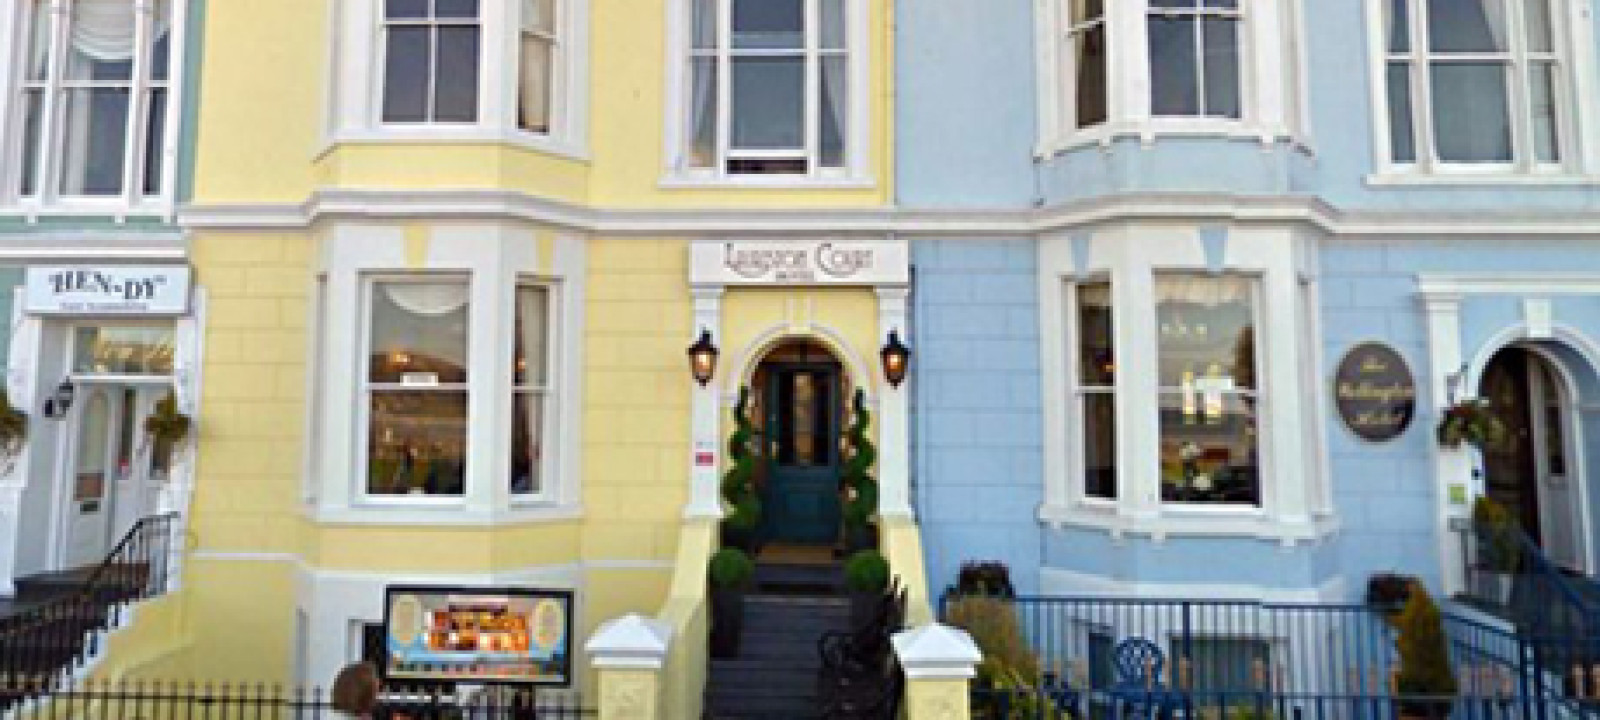 Welsh Hotel